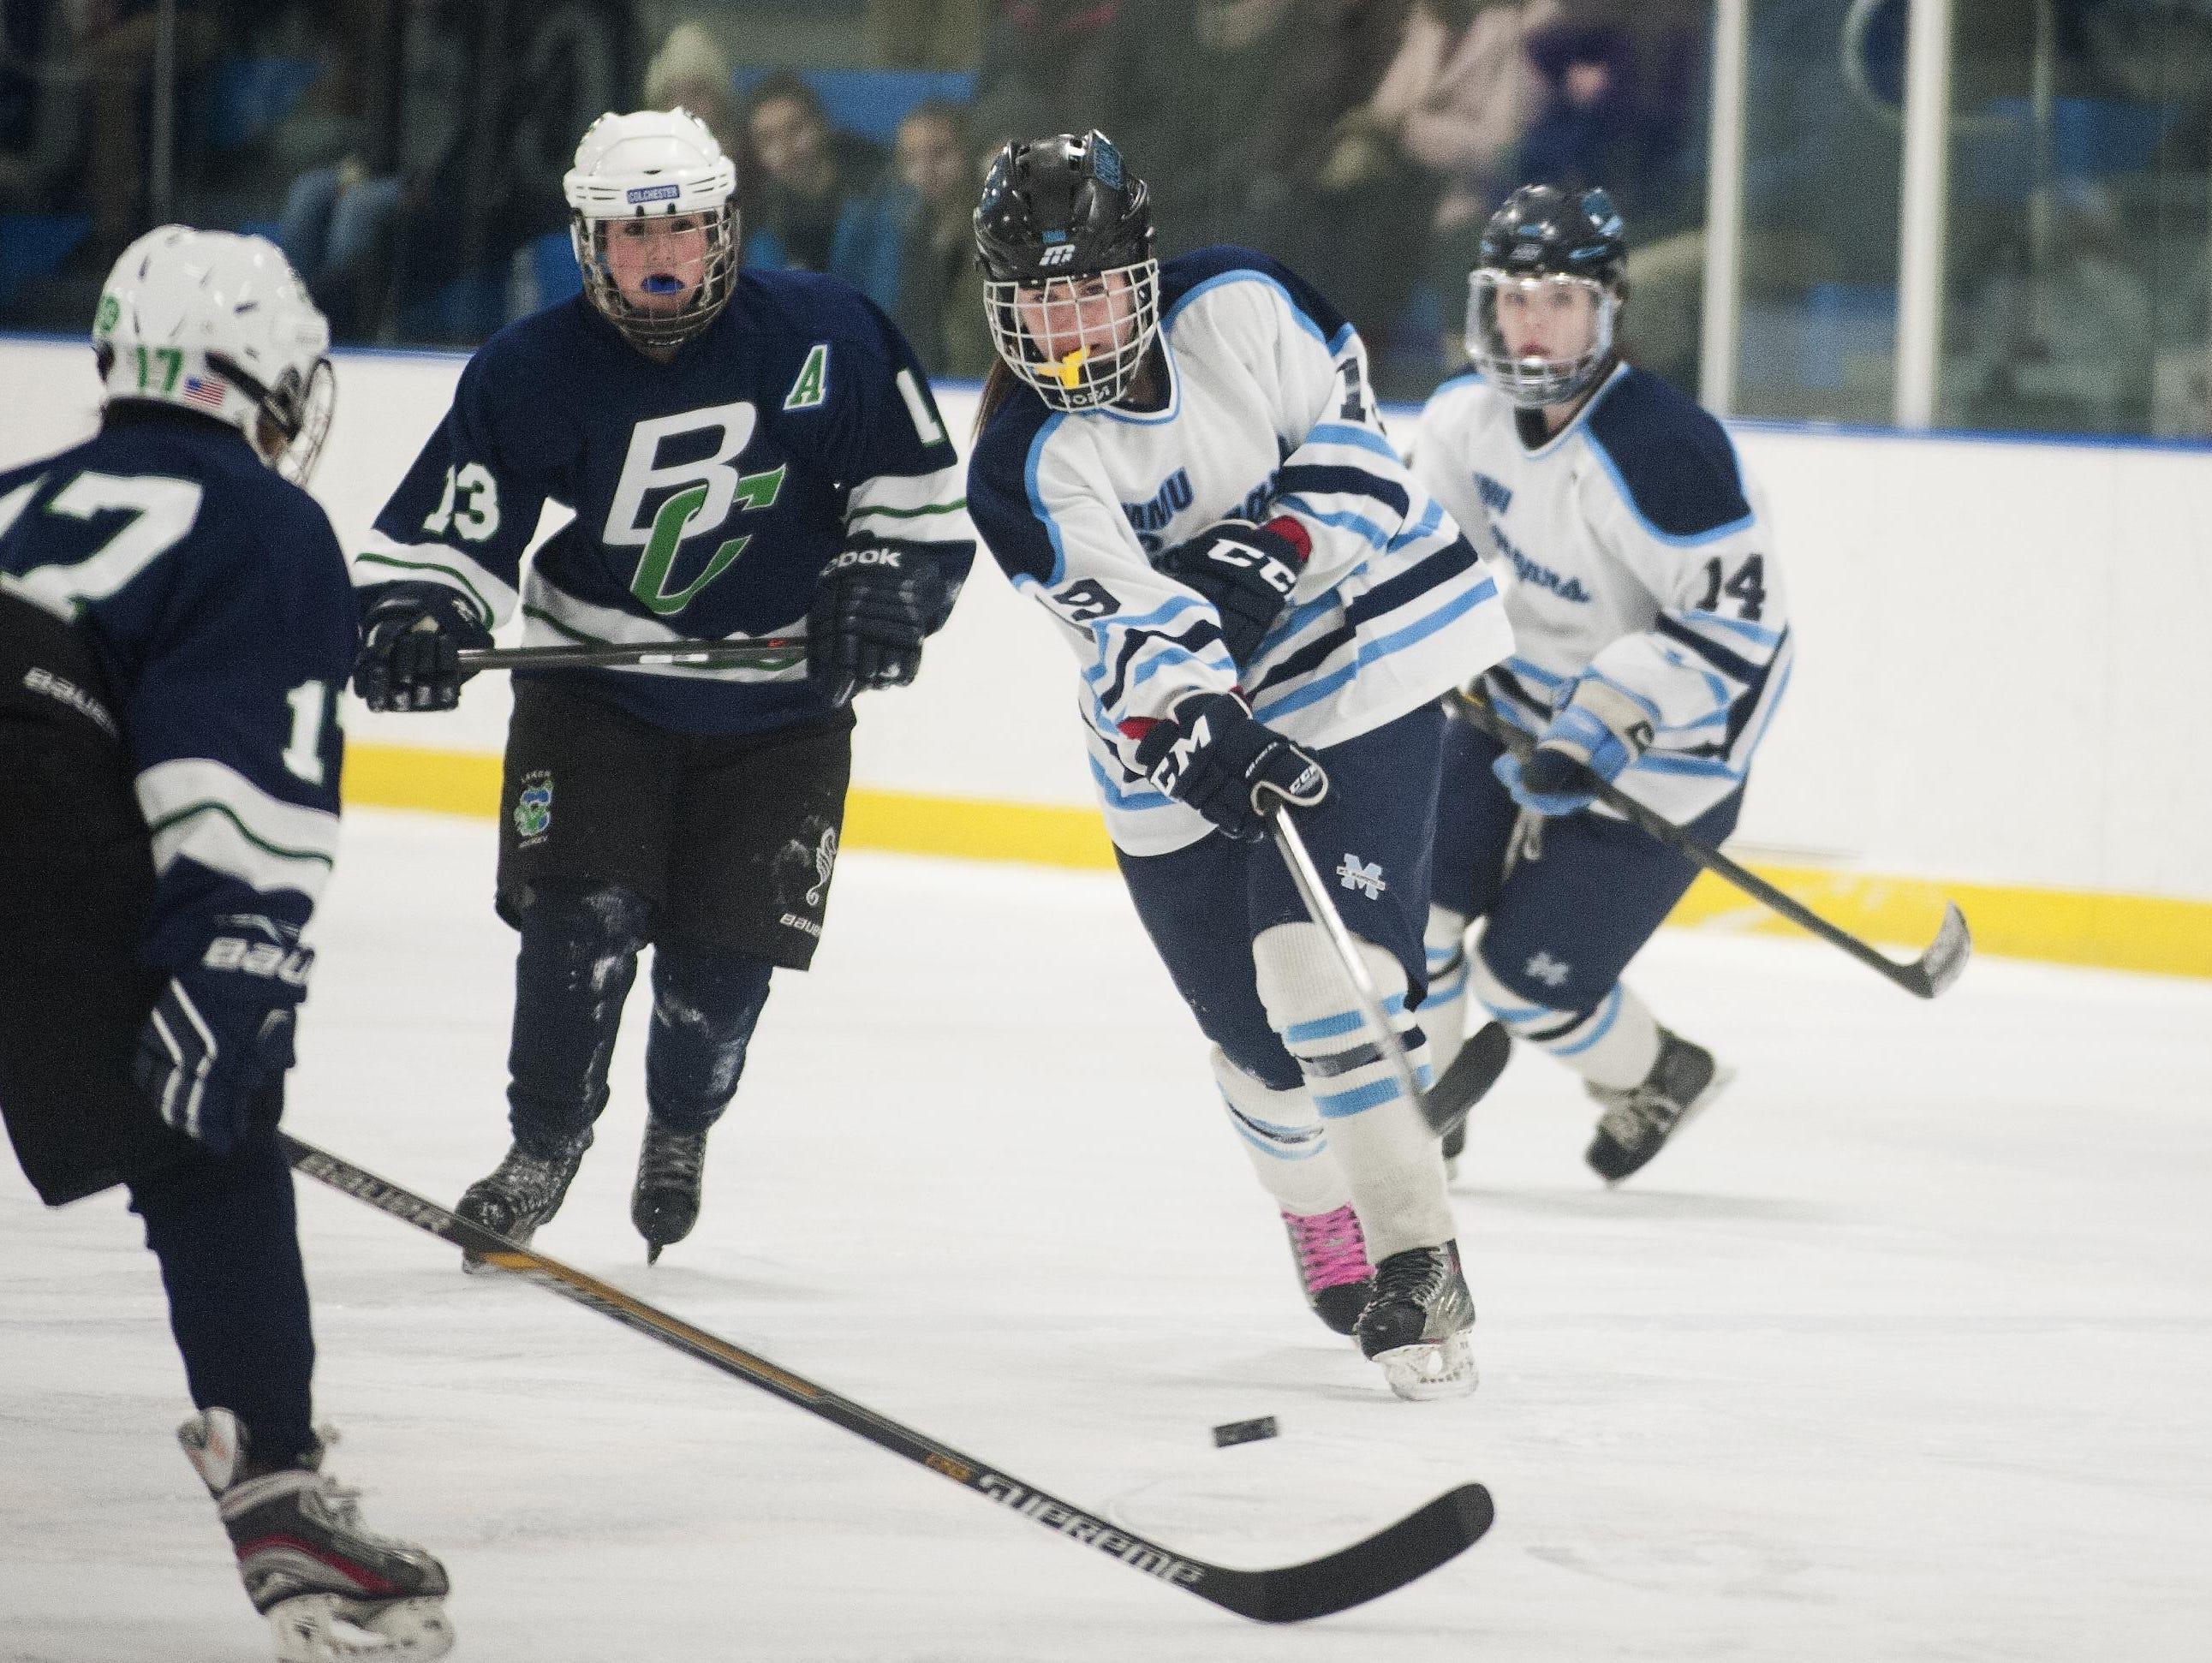 MMU's Anna Burke (19) takes a shot during a girl playoff hockey game last season.